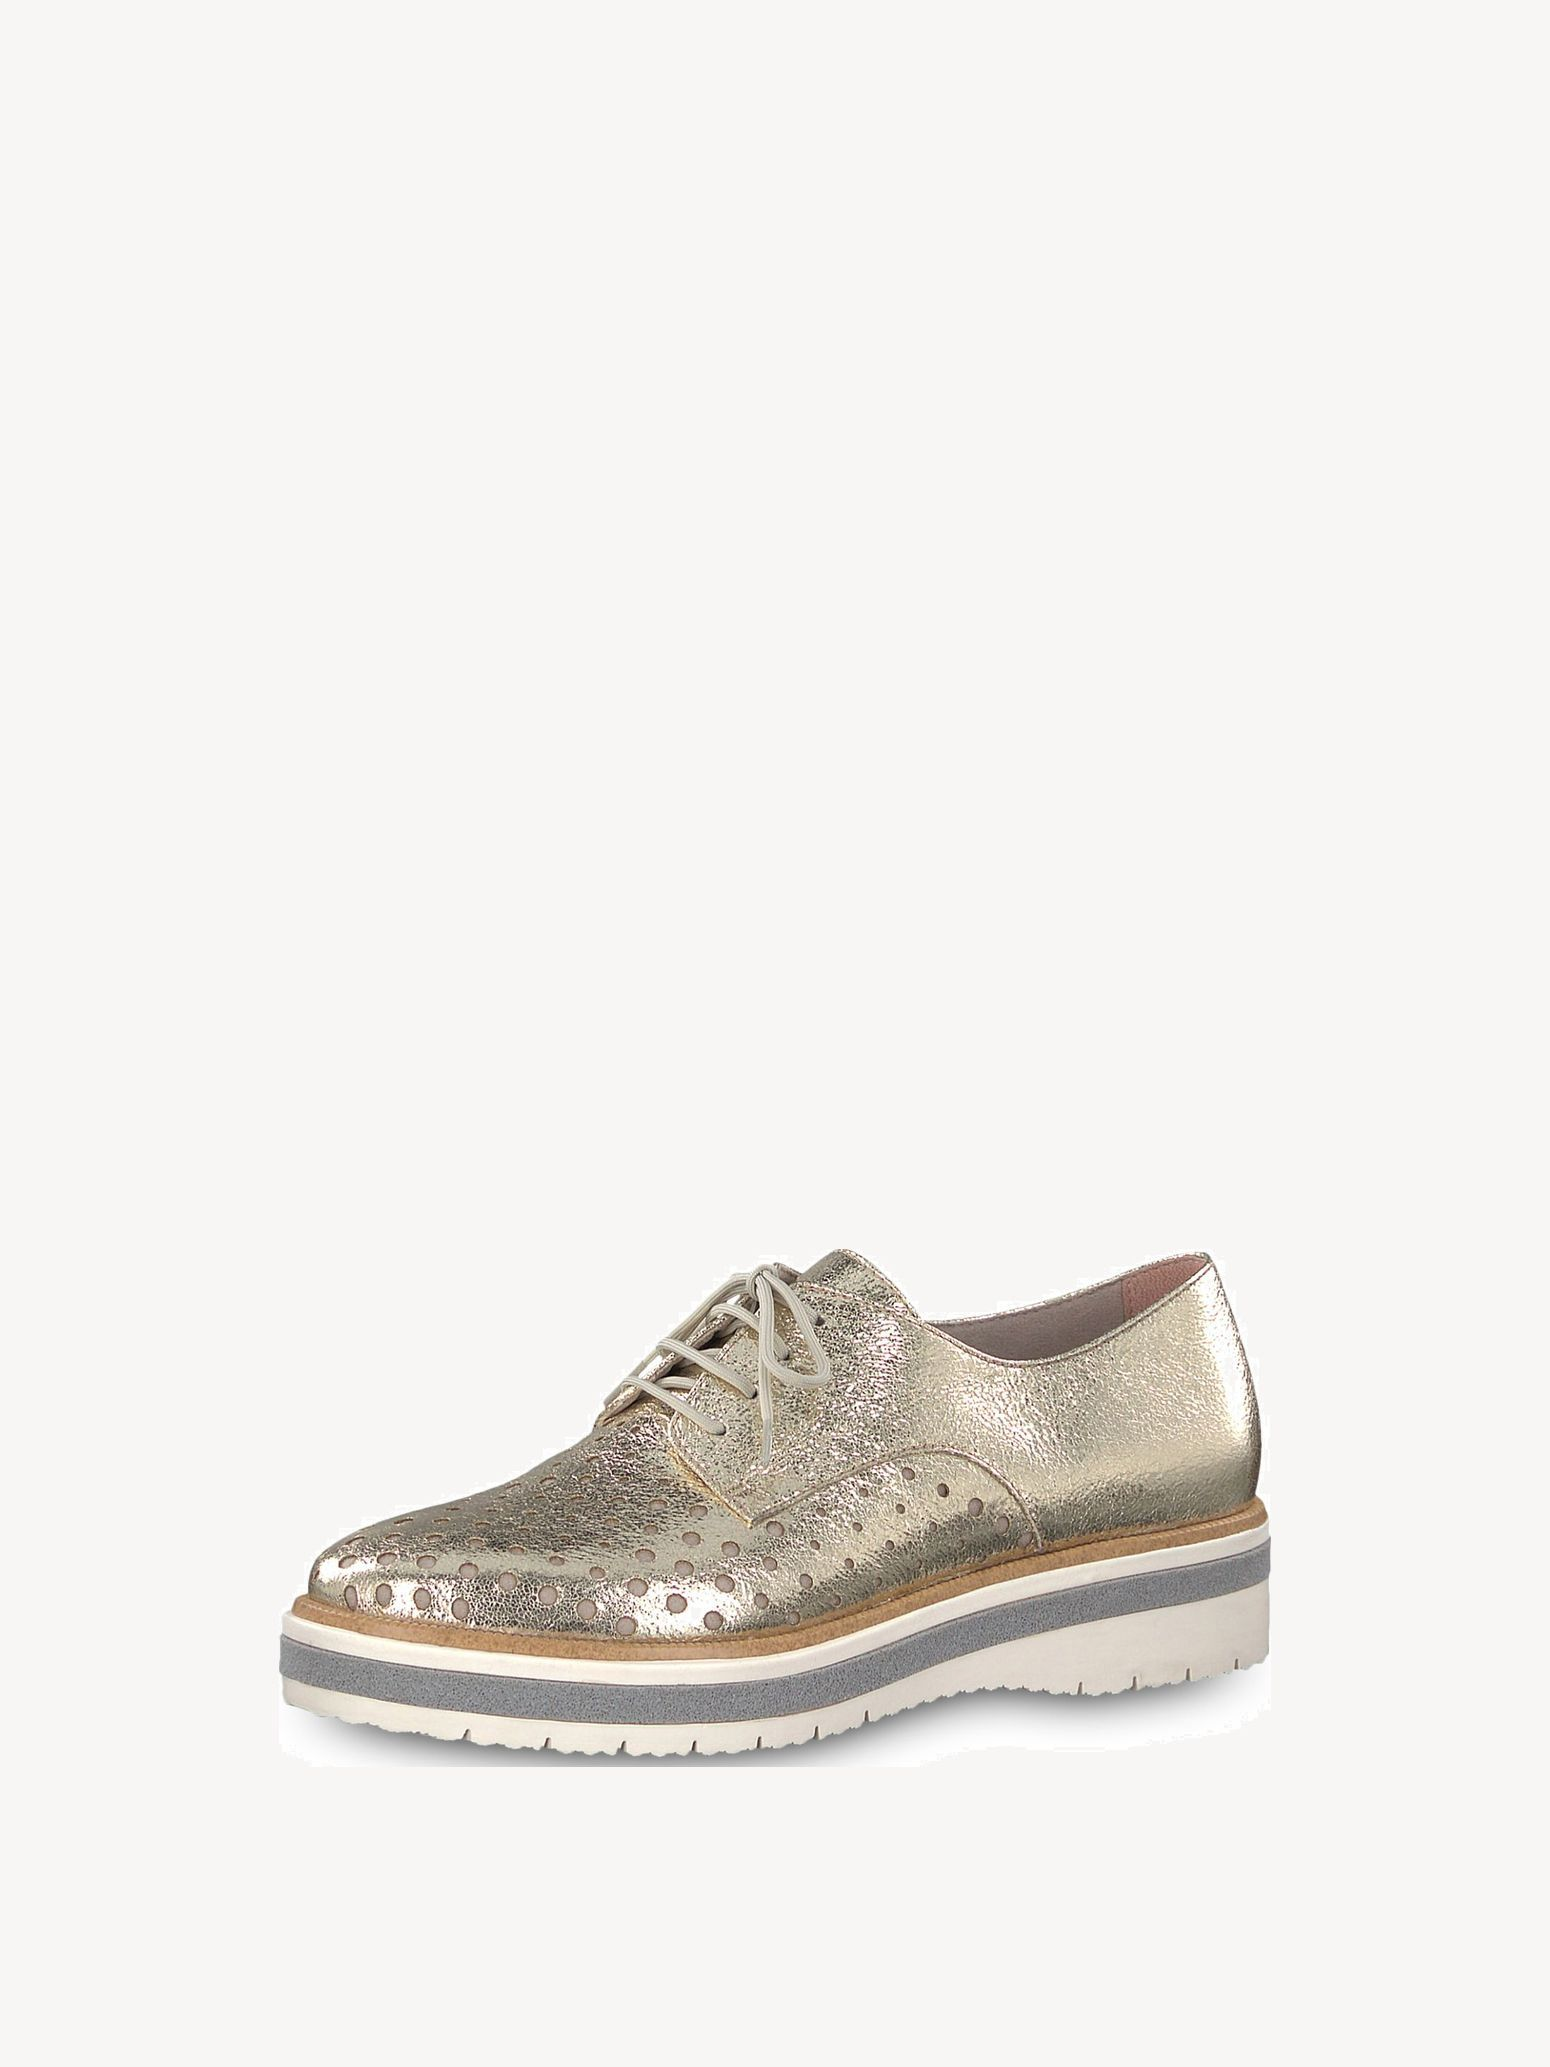 vivienne 1 1 23753 20 buy tamaris low shoes online. Black Bedroom Furniture Sets. Home Design Ideas